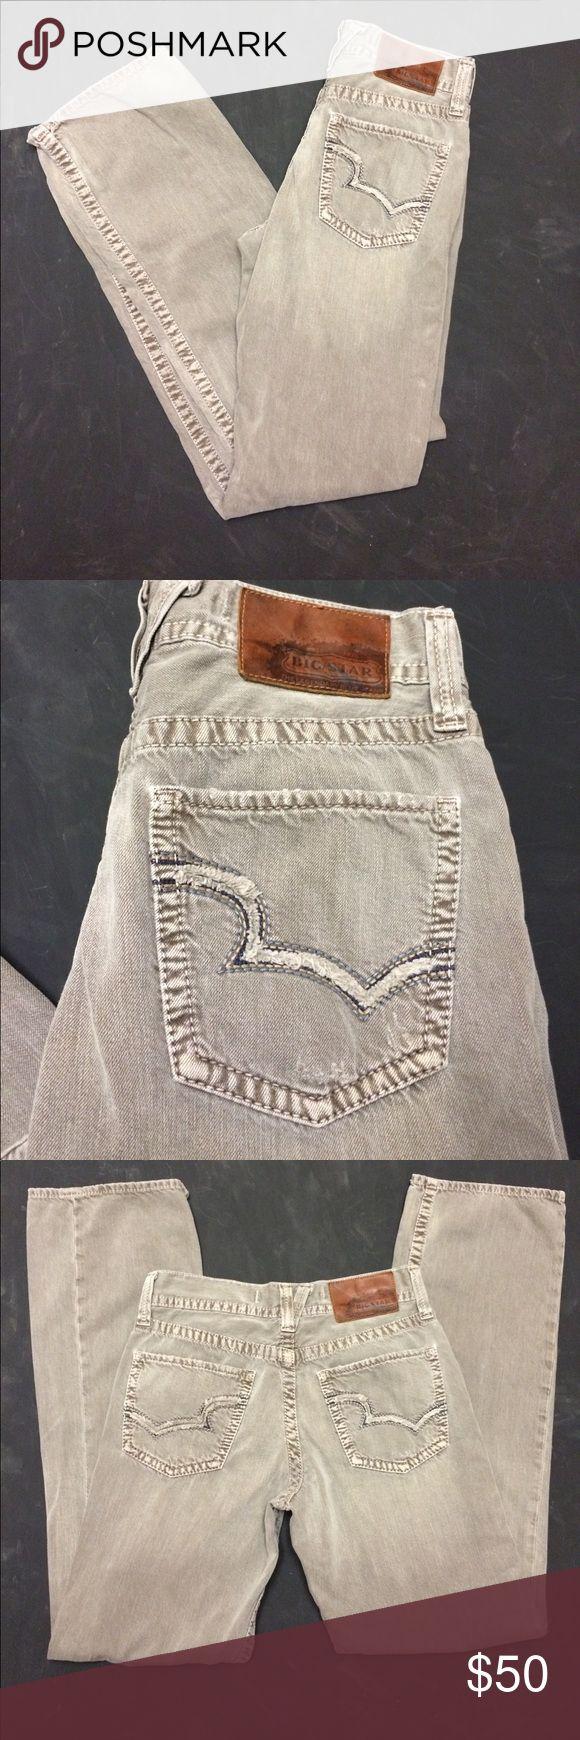 "Big Star - Rare ""Pioneer"" Gray Distressed Jeans Big Star - ""Pioneer"" bootcut jeans - Factory distressed - Size 30 - 32"" inseam - 9.5"" rise - EUC! Big Star Jeans Bootcut"